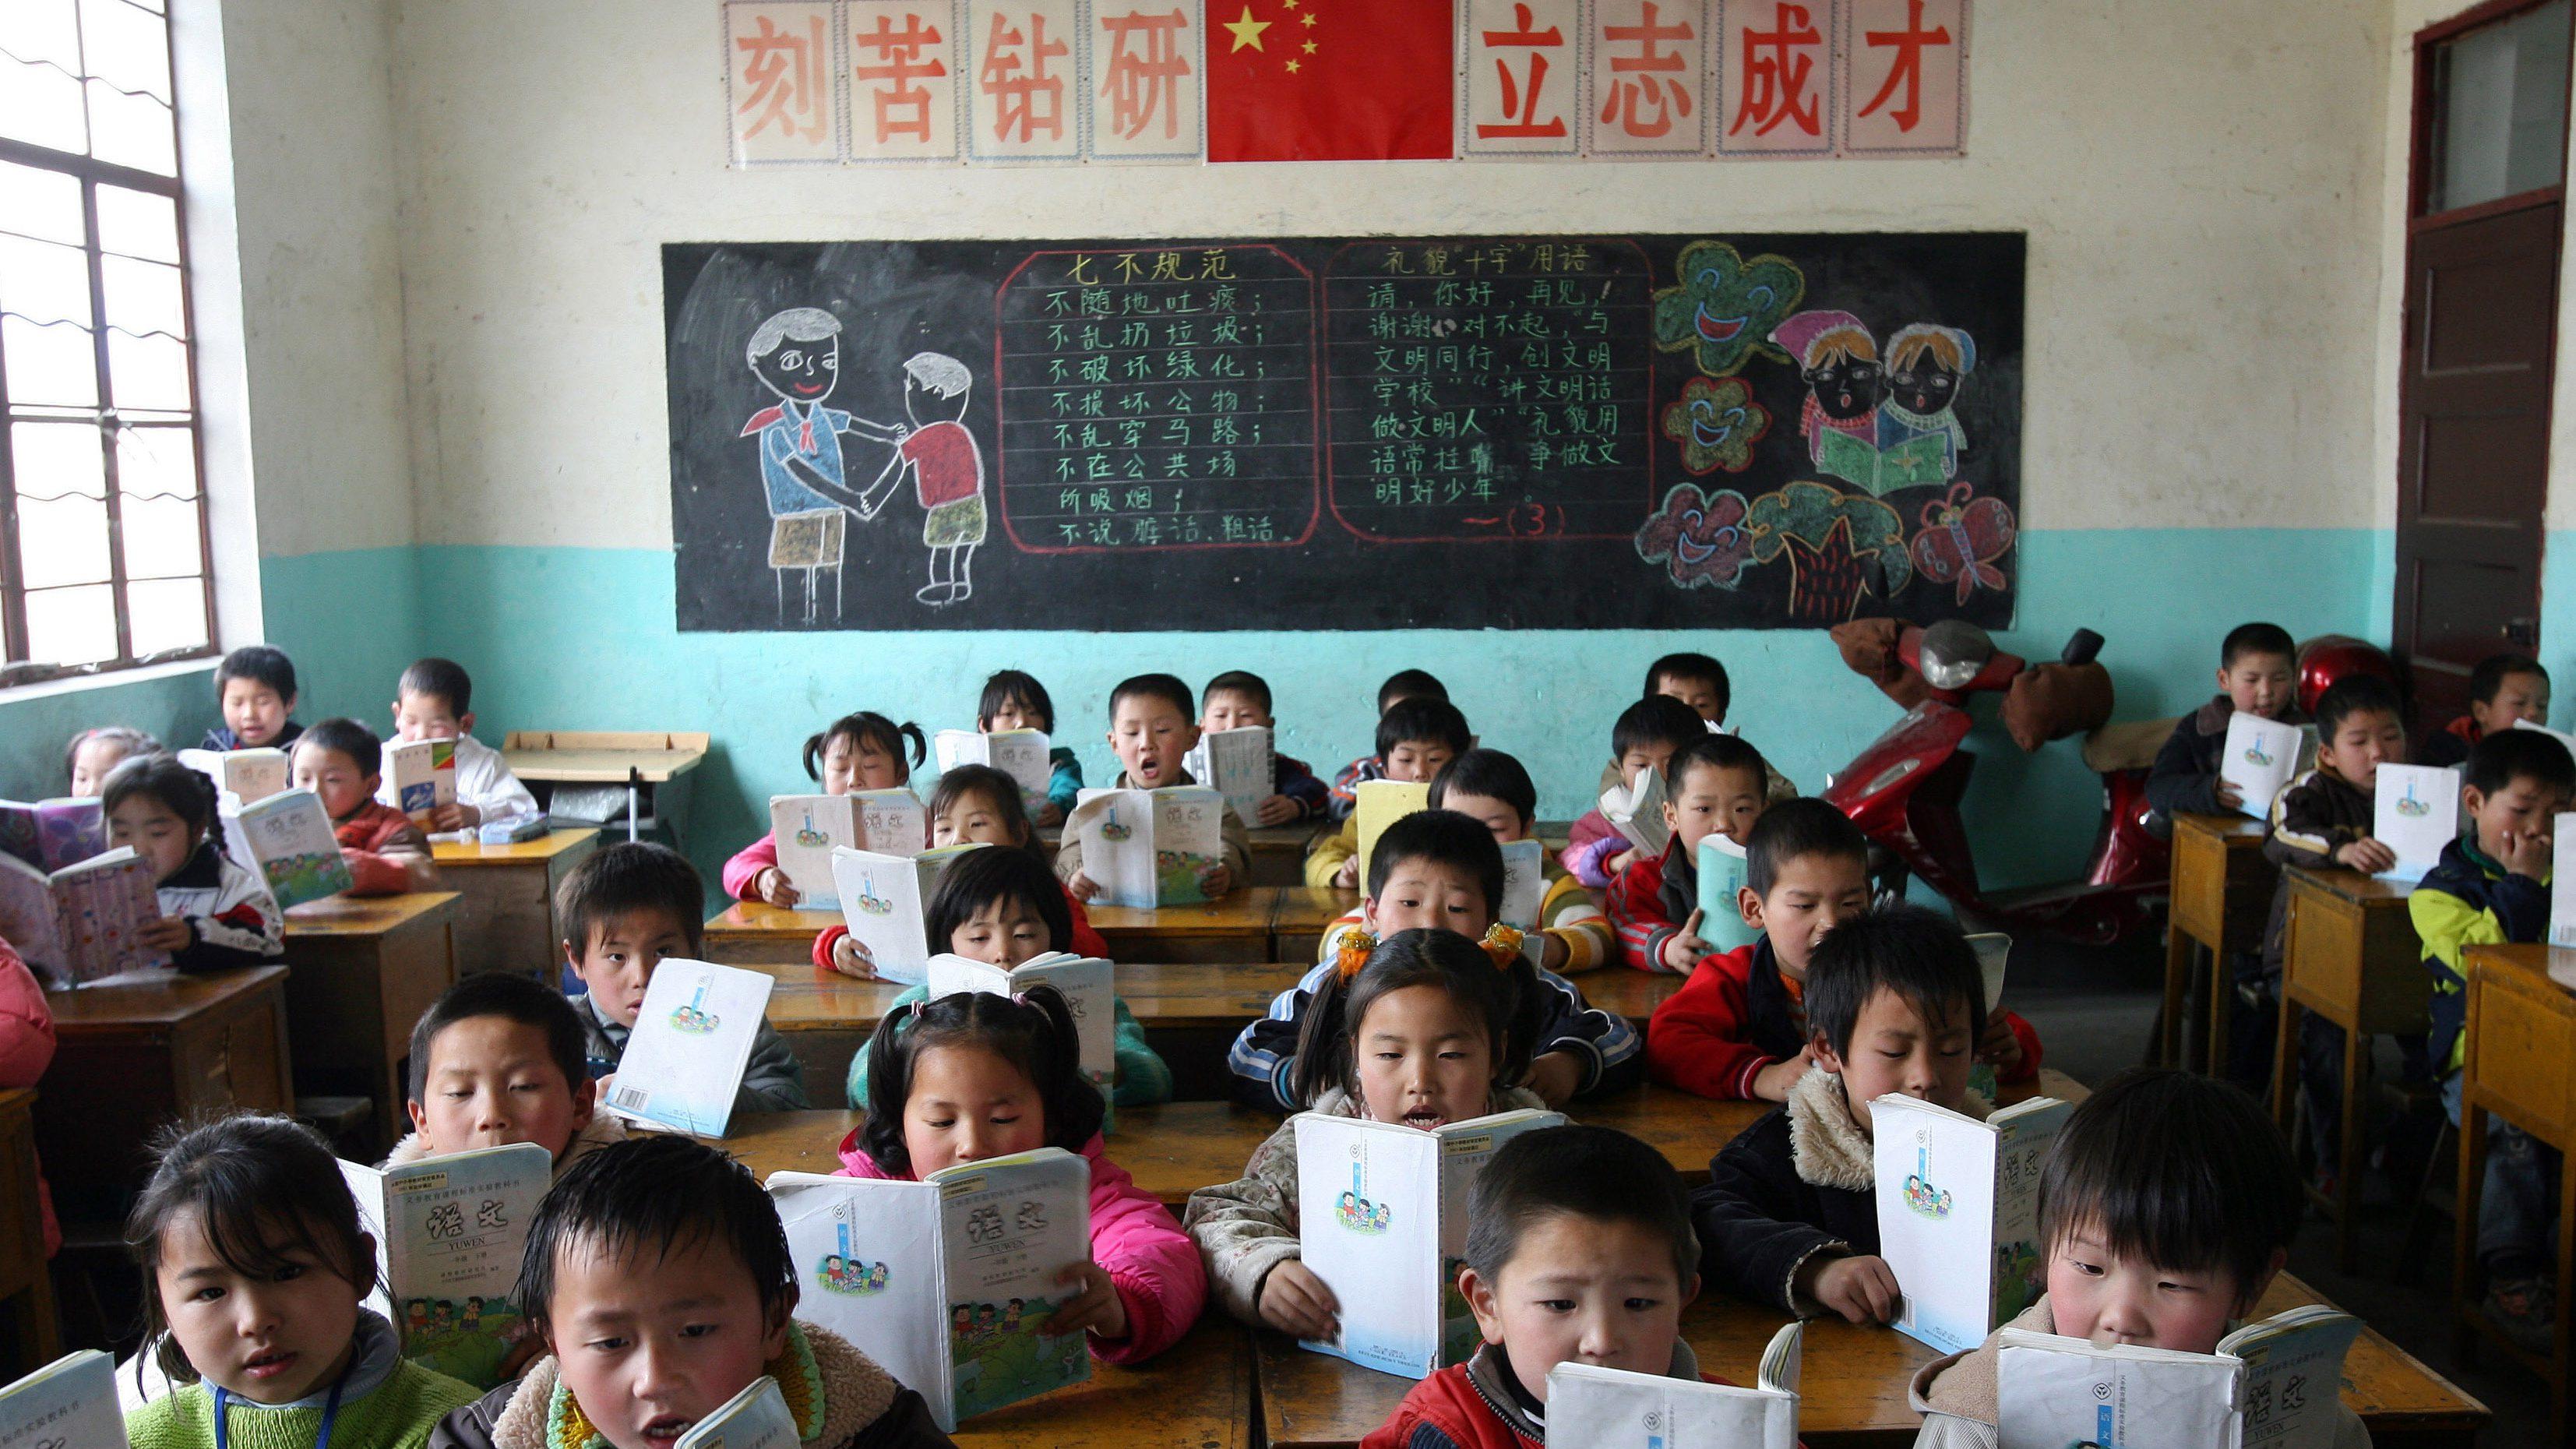 China's fabled, slightly brutal